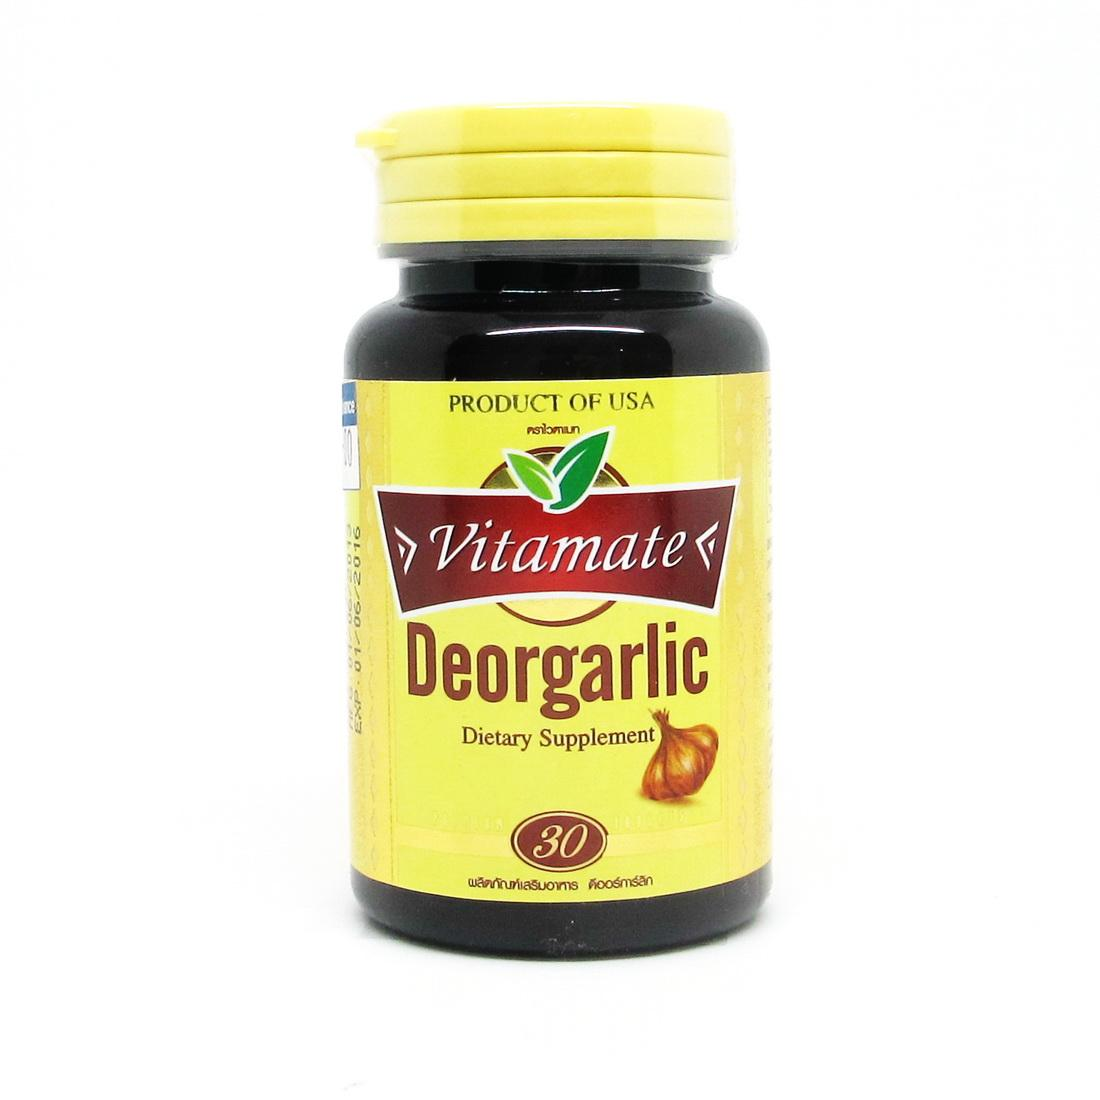 Vitamate Deogarlic 30เม็ด สำเนา